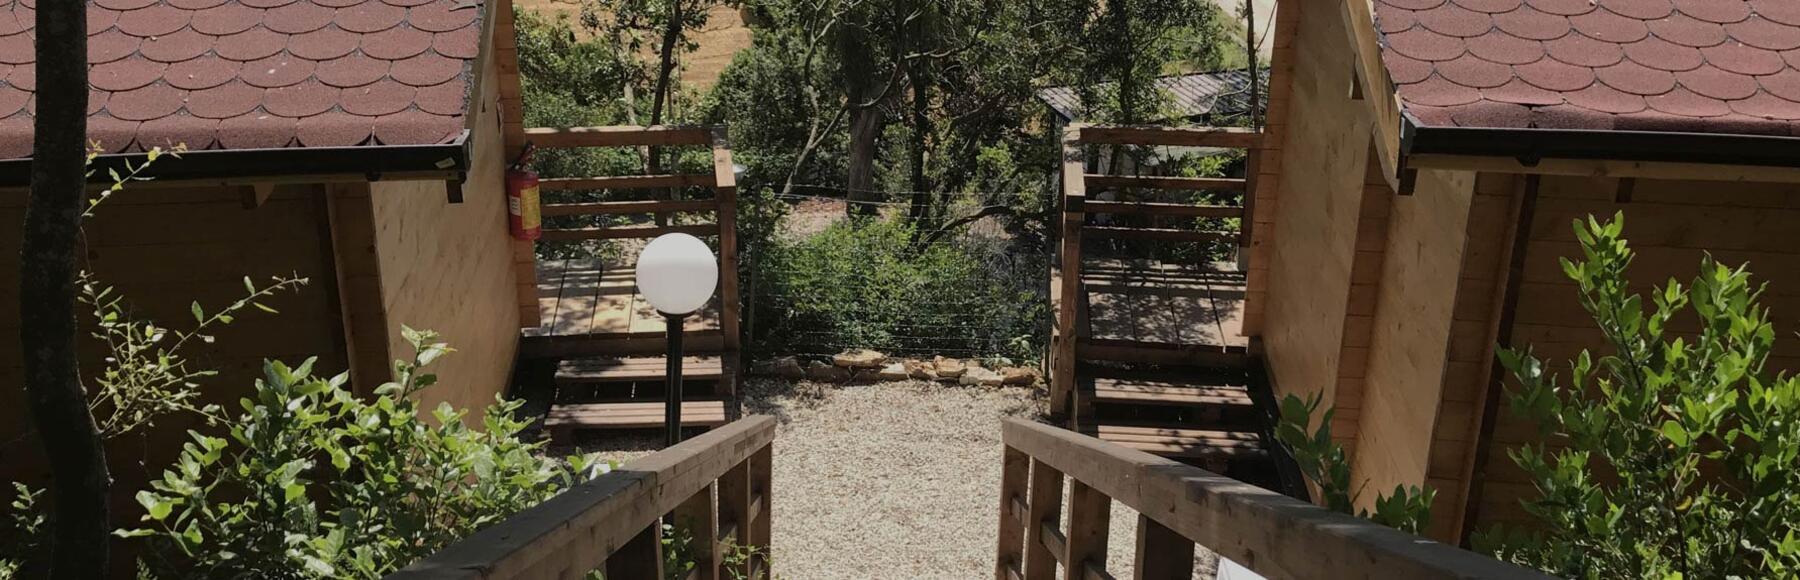 elbadoc-campingvillage it contatti 006